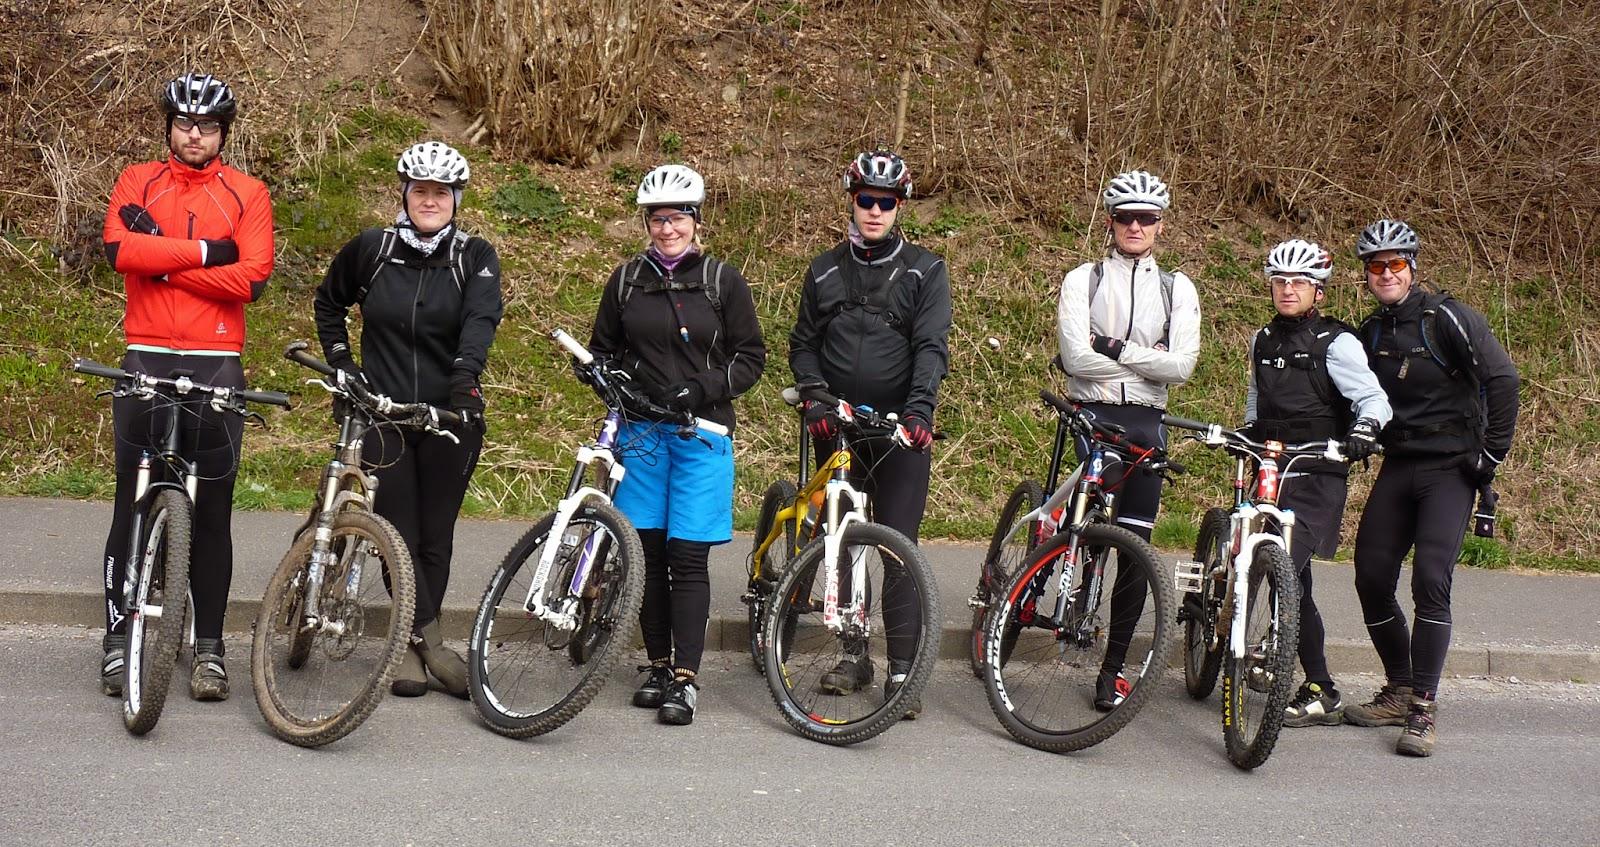 Spessart-Biker Tour am 22. März 2015